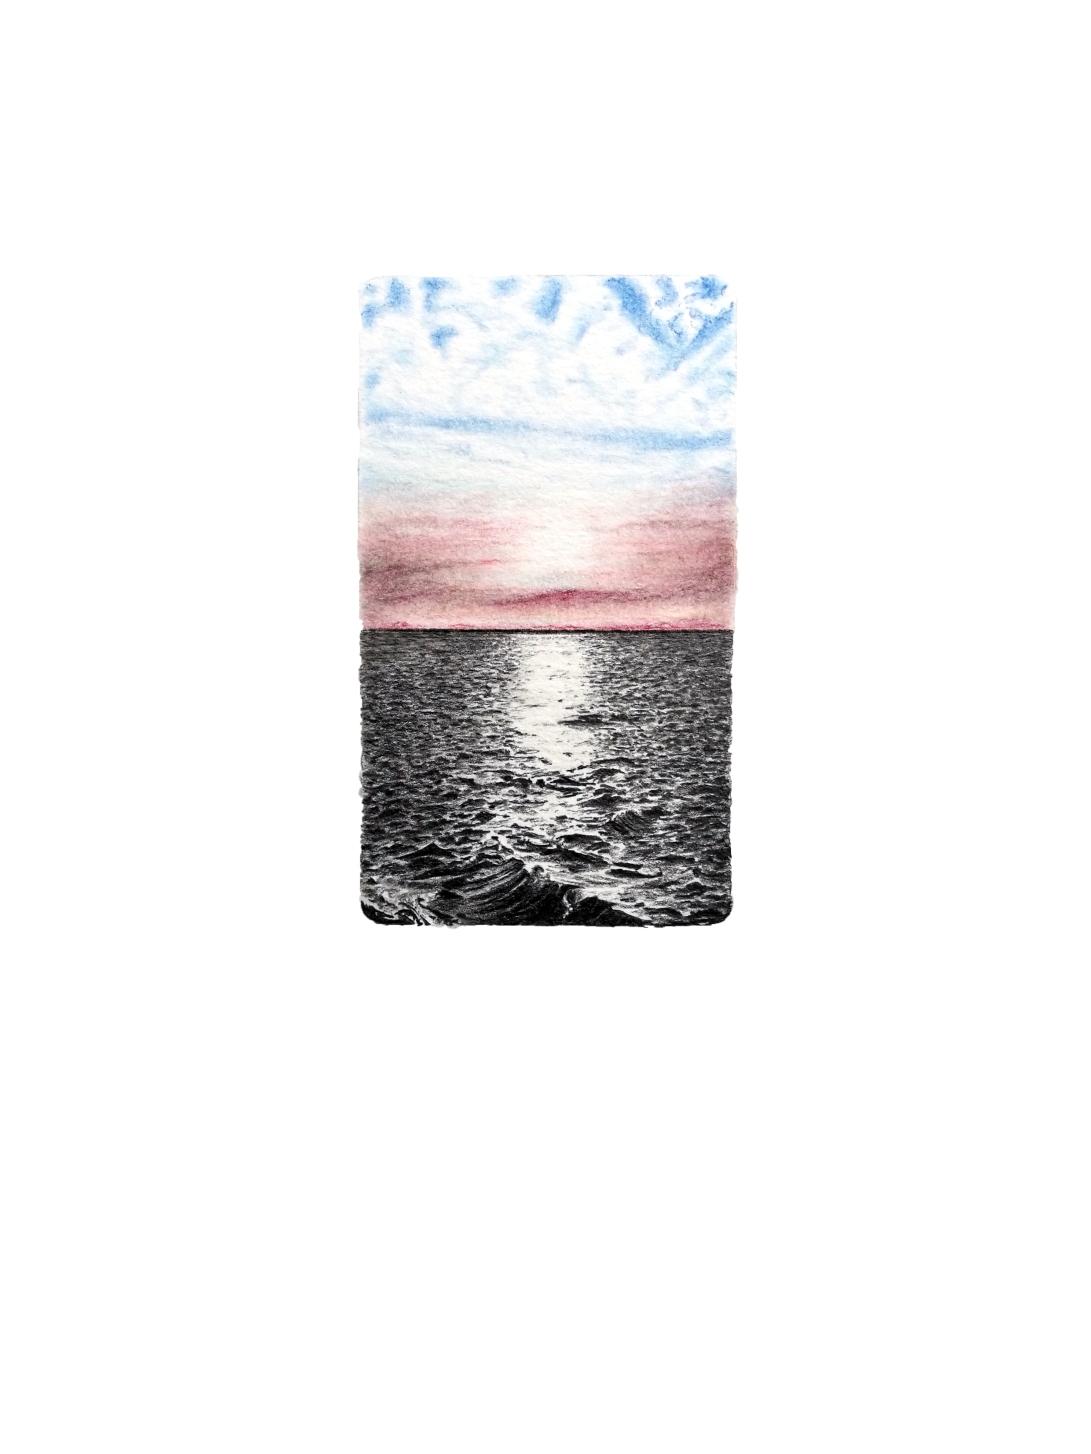 Sunrise, graphite and colour pencil on paper, 28cm x 21cm, 2018